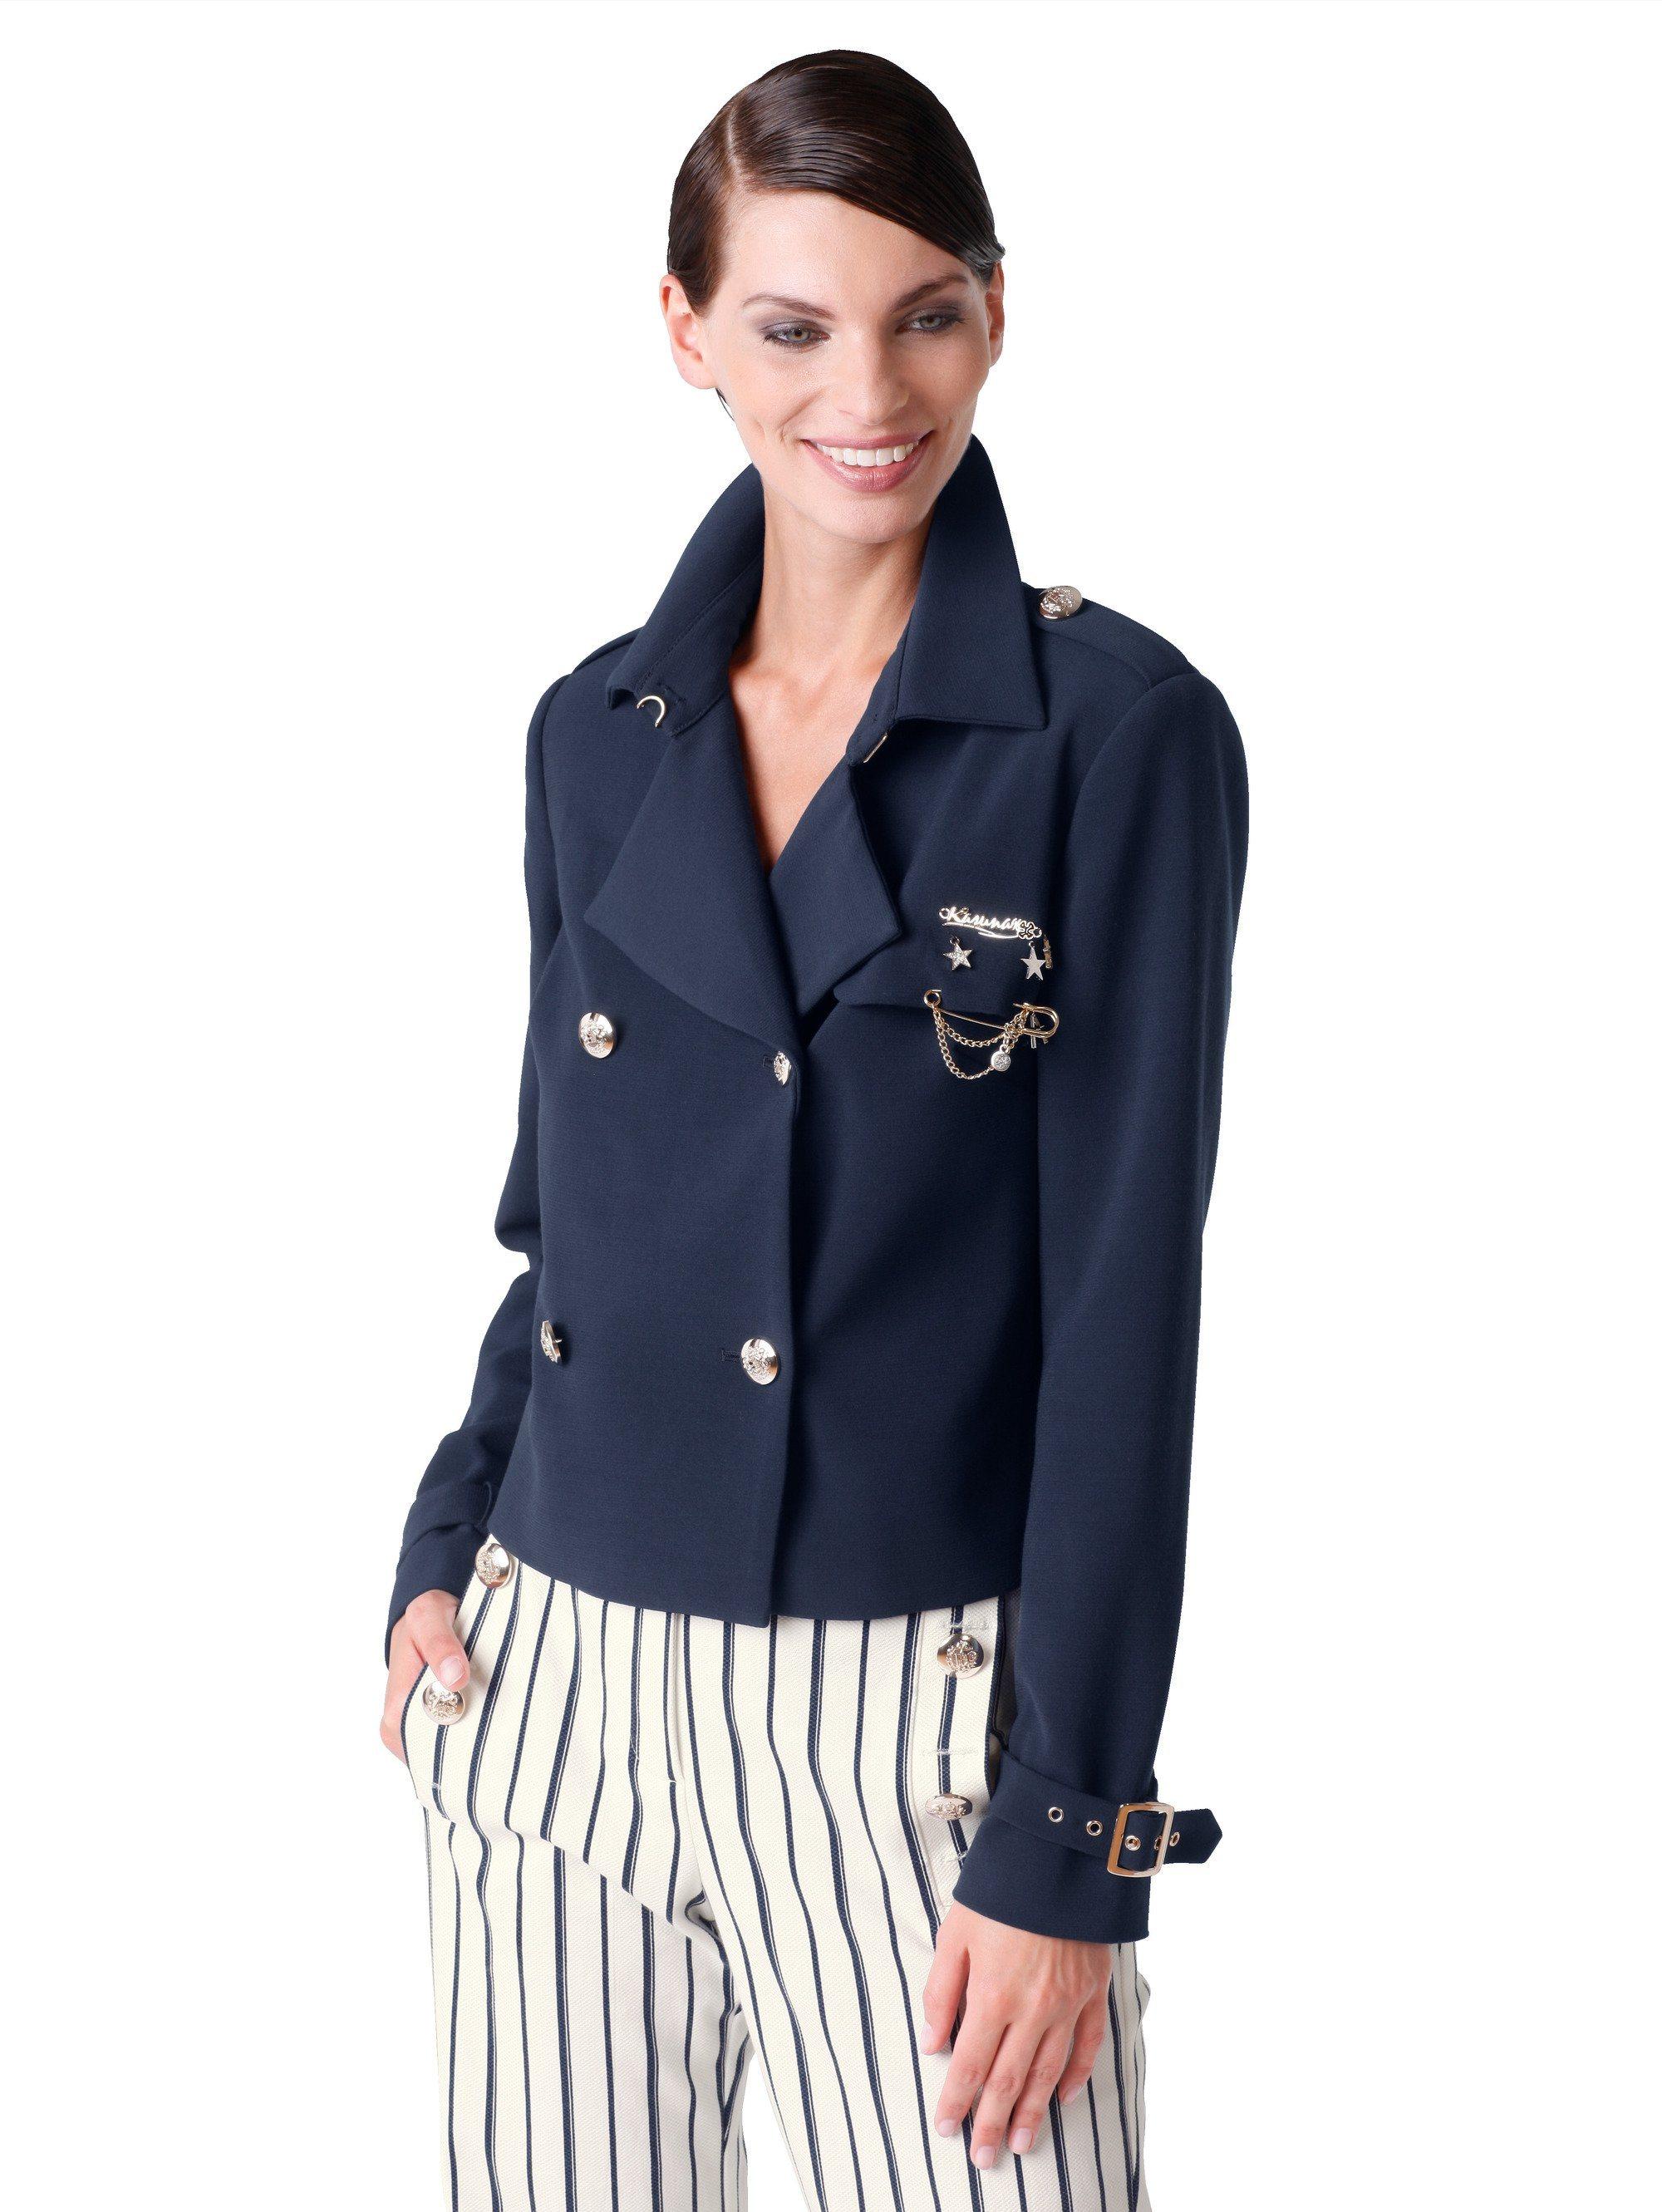 Alba Moda Kurzjacke im Trenchcoat-Style | Bekleidung > Mäntel > Trenchcoats | Goldfarbenen | Polyester - Viskose - Elasthan - Acetat | Alba Moda